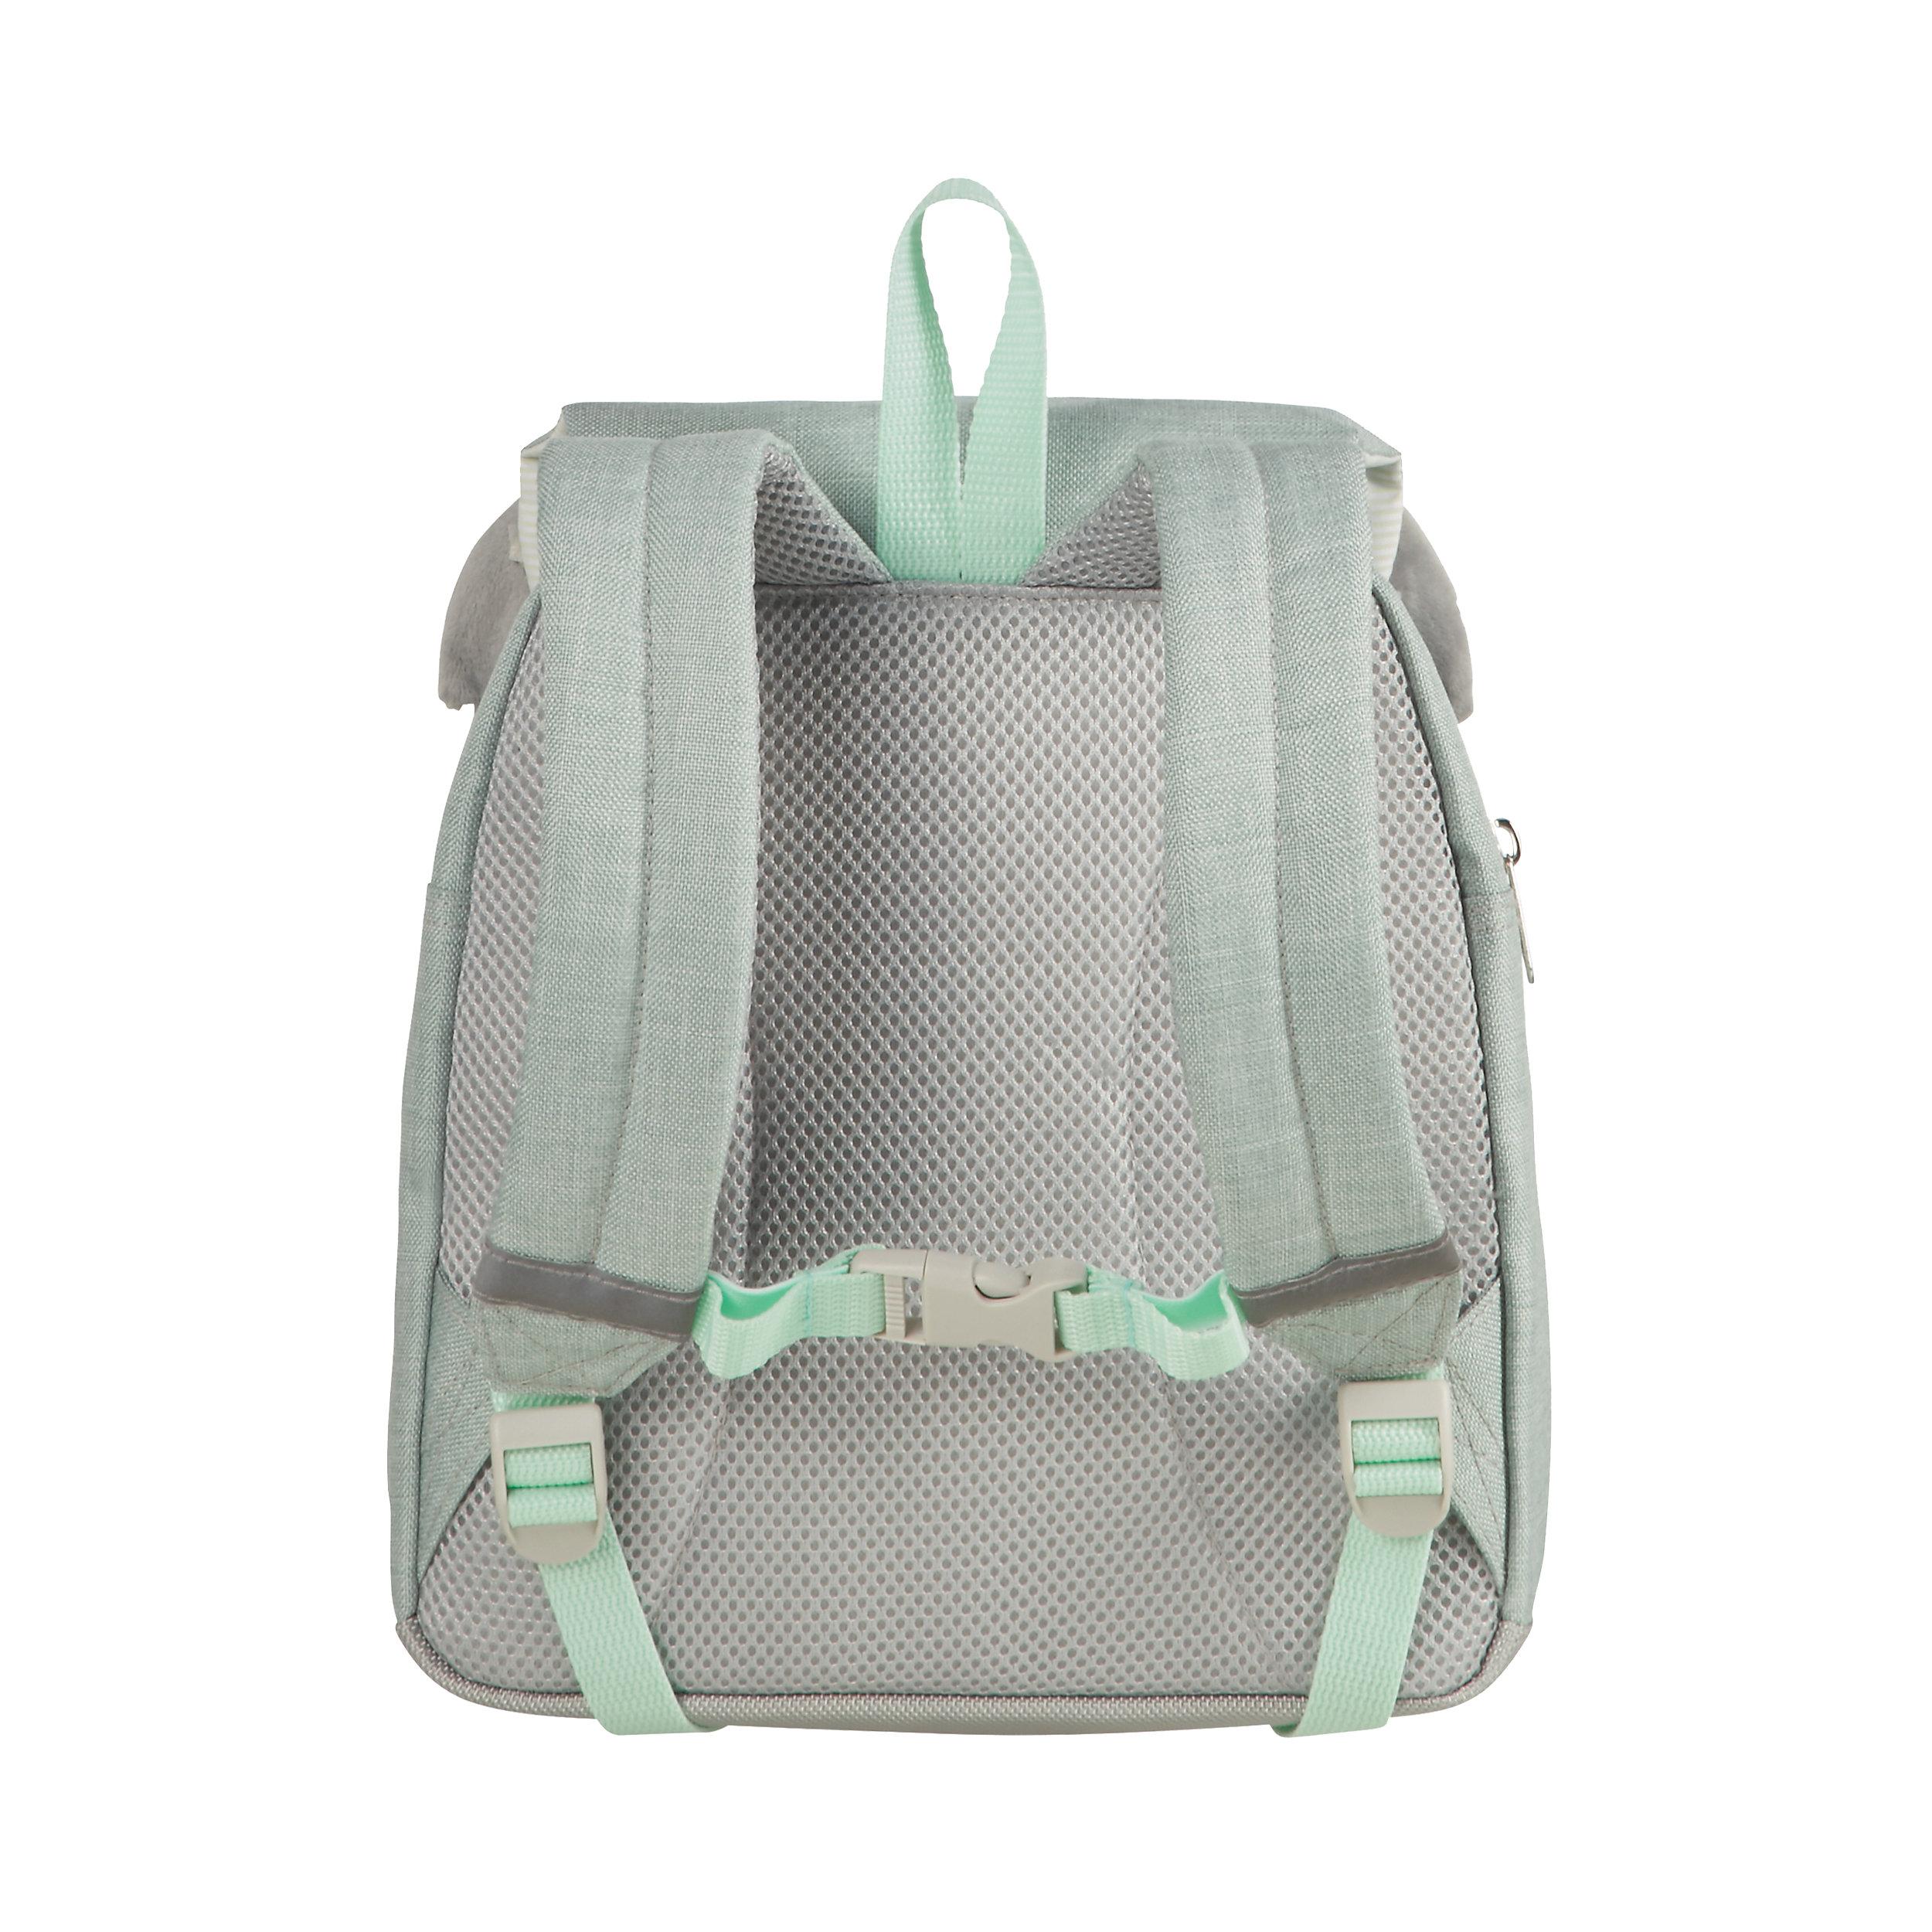 Backpack S Koala Kody Happy Sammies 7 Liter